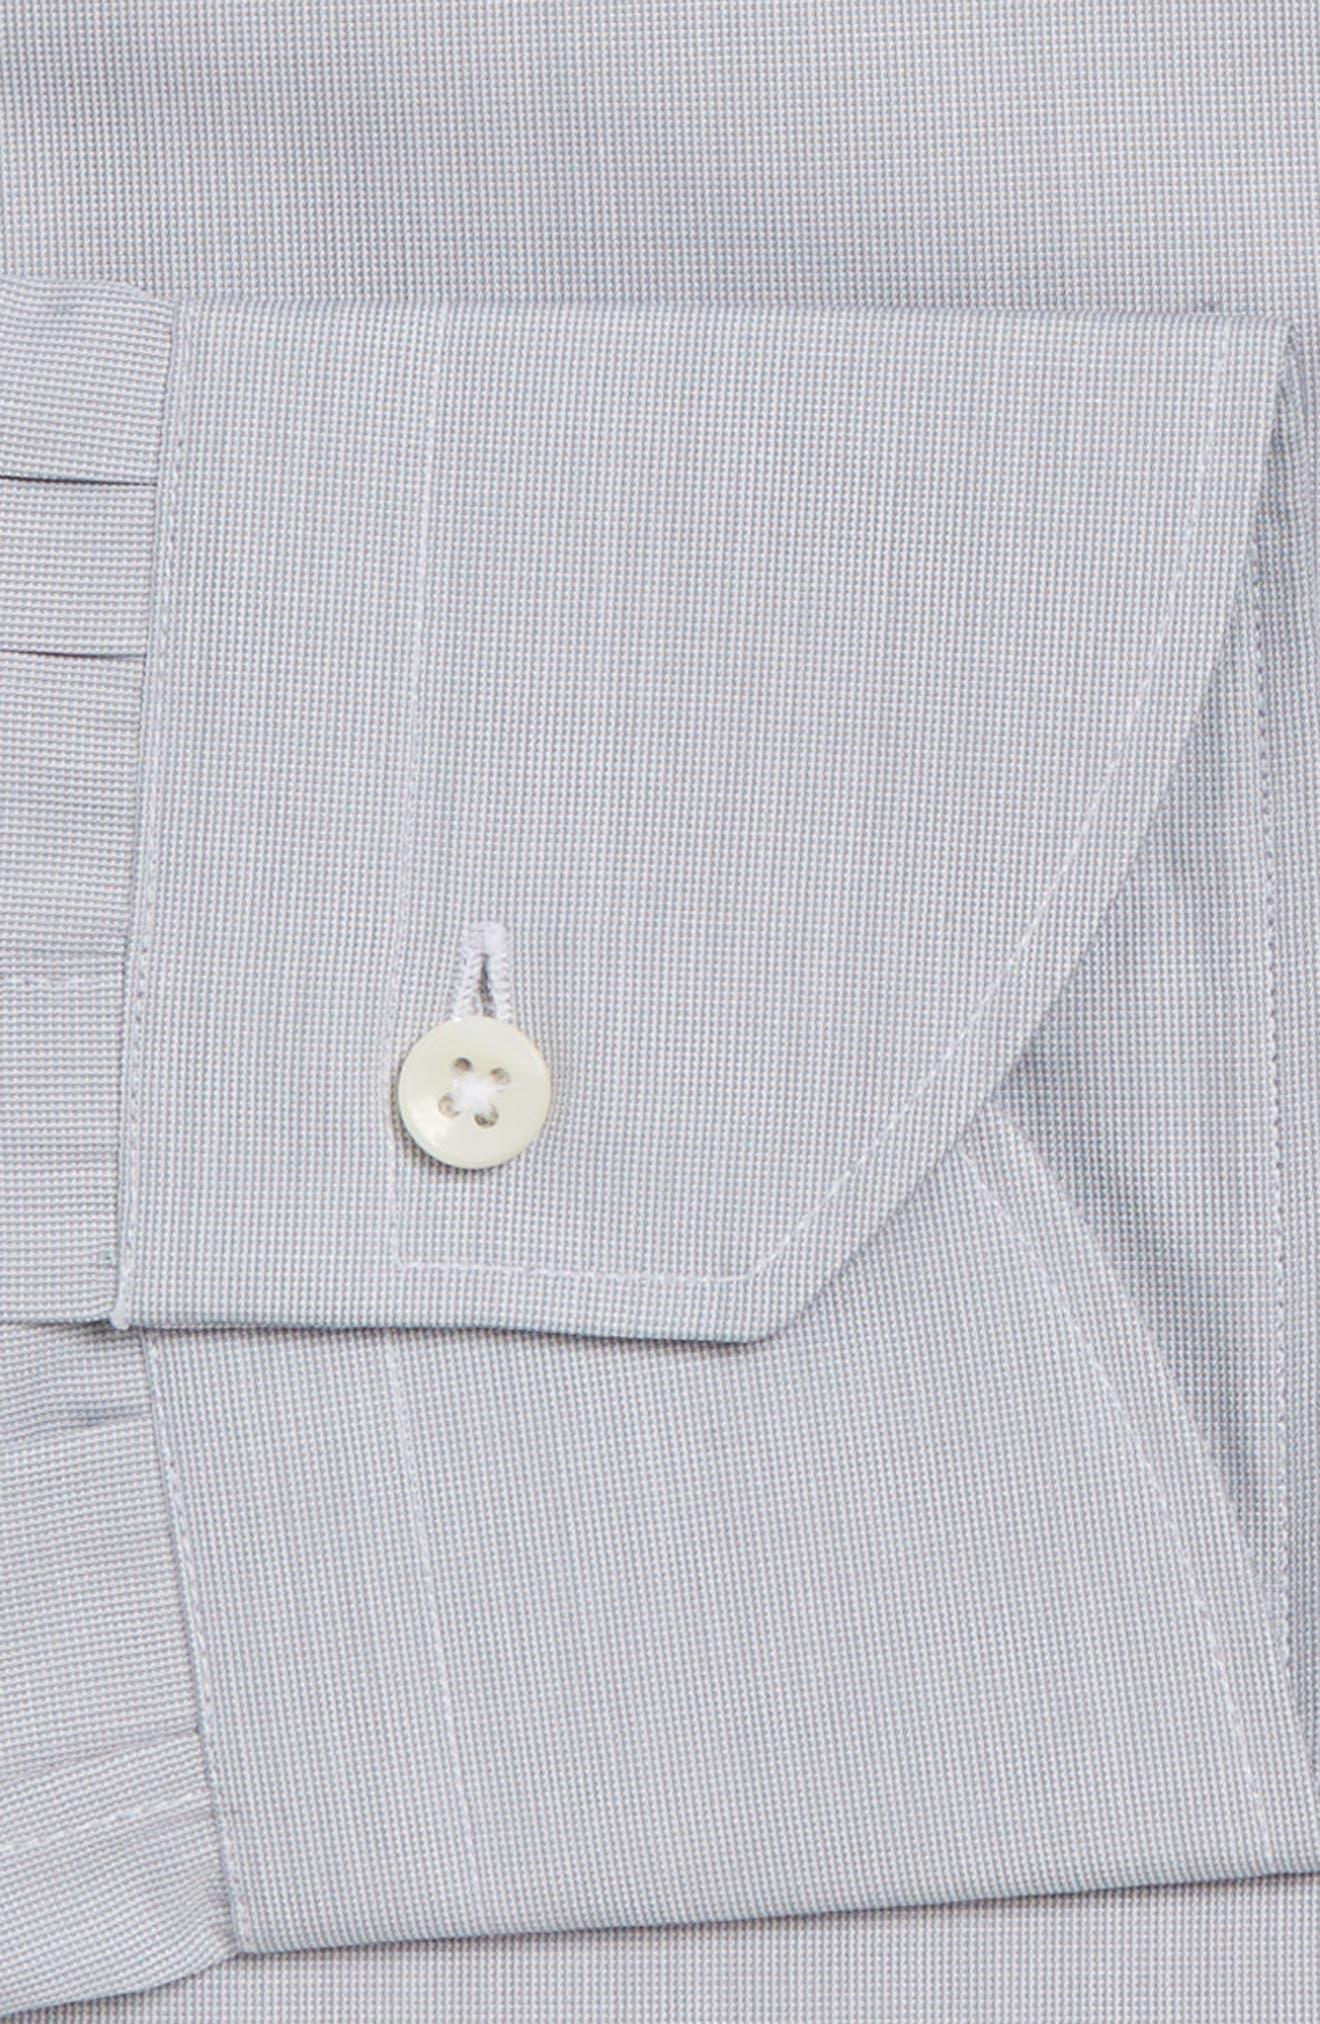 Regular Fit Solid Dress Shirt,                             Alternate thumbnail 3, color,                             050